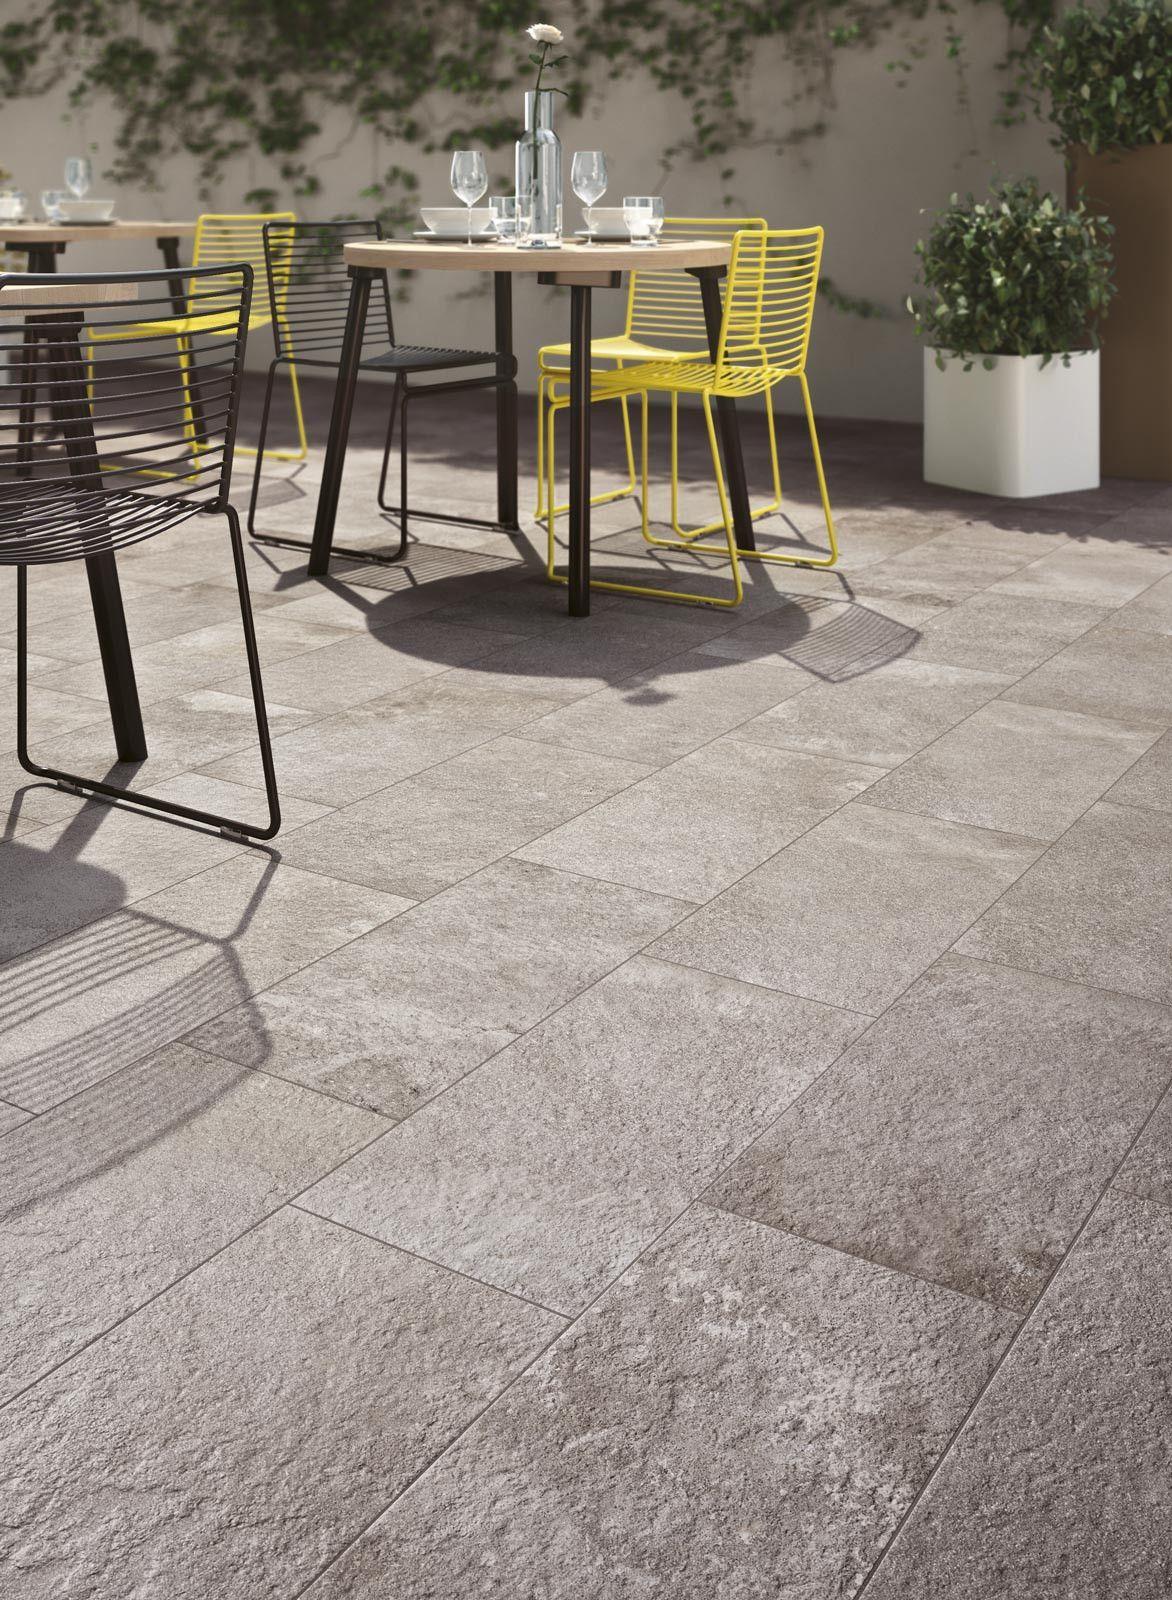 Ragno #Stoneway_Porfido Grey 15x15 cm R47P | #Gres #pietra #15x15 ...